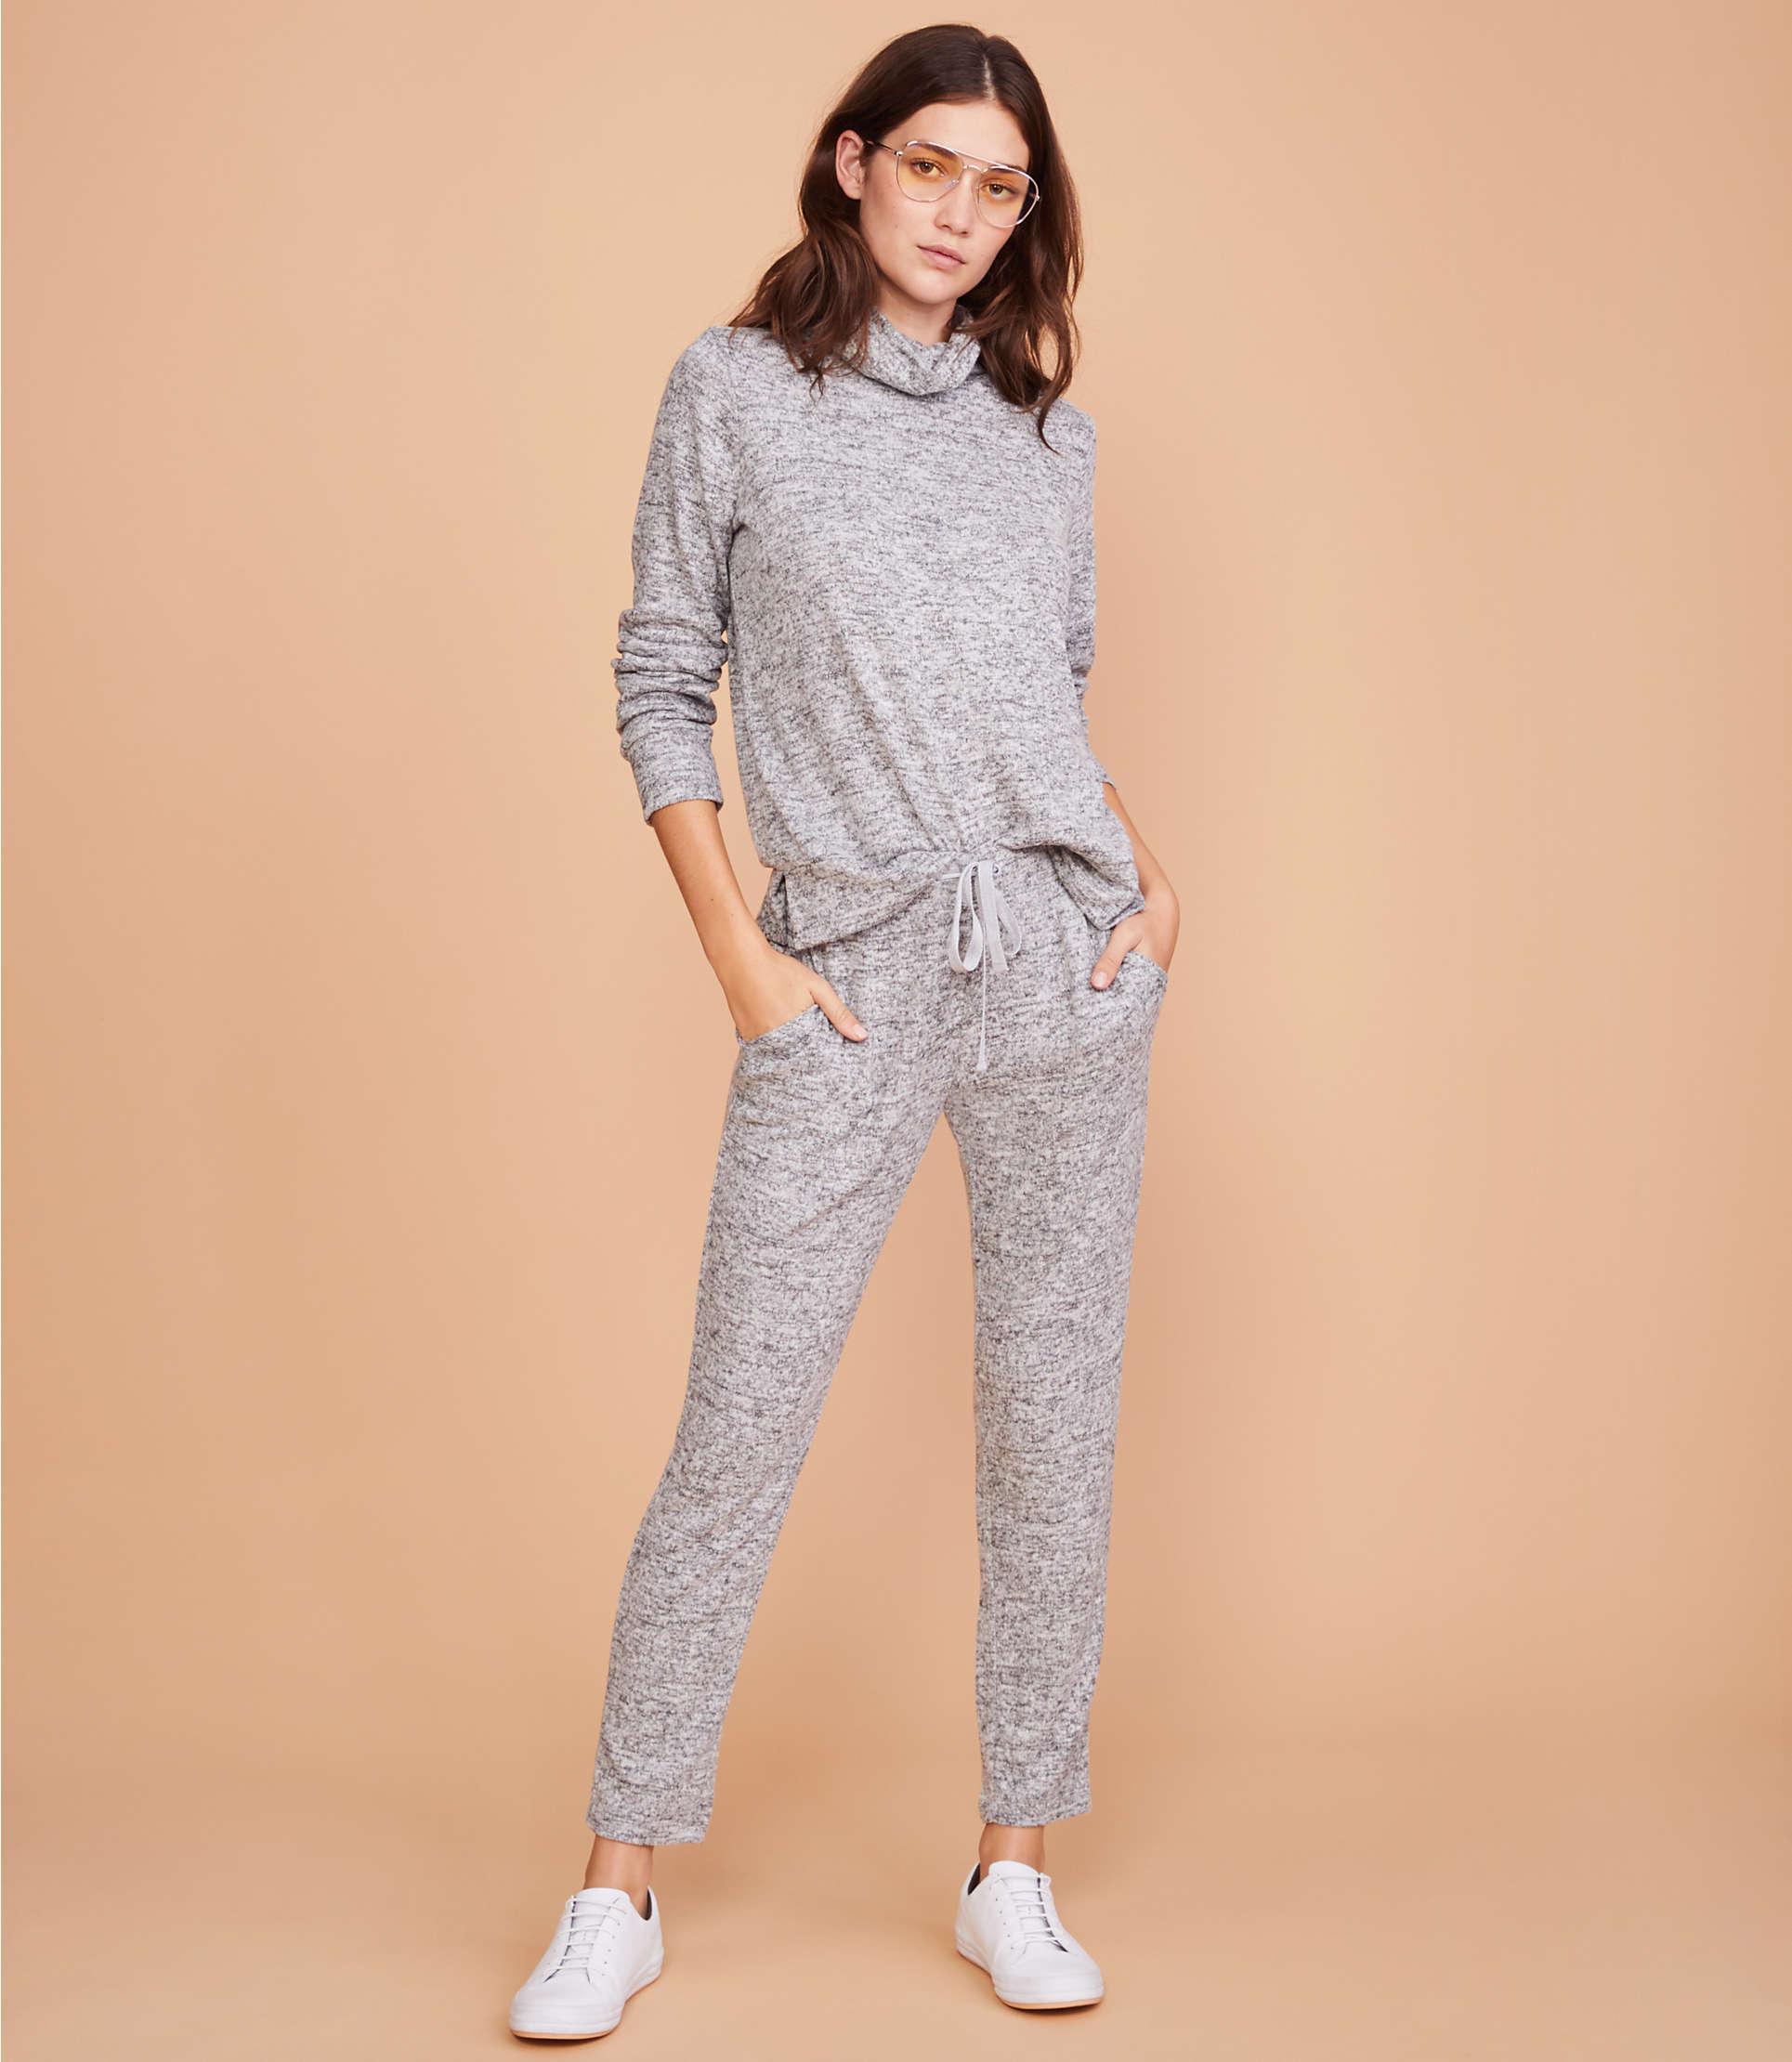 814dd848155c0 Lyst - Lou & Grey Brushmarl Sweatpants in Gray